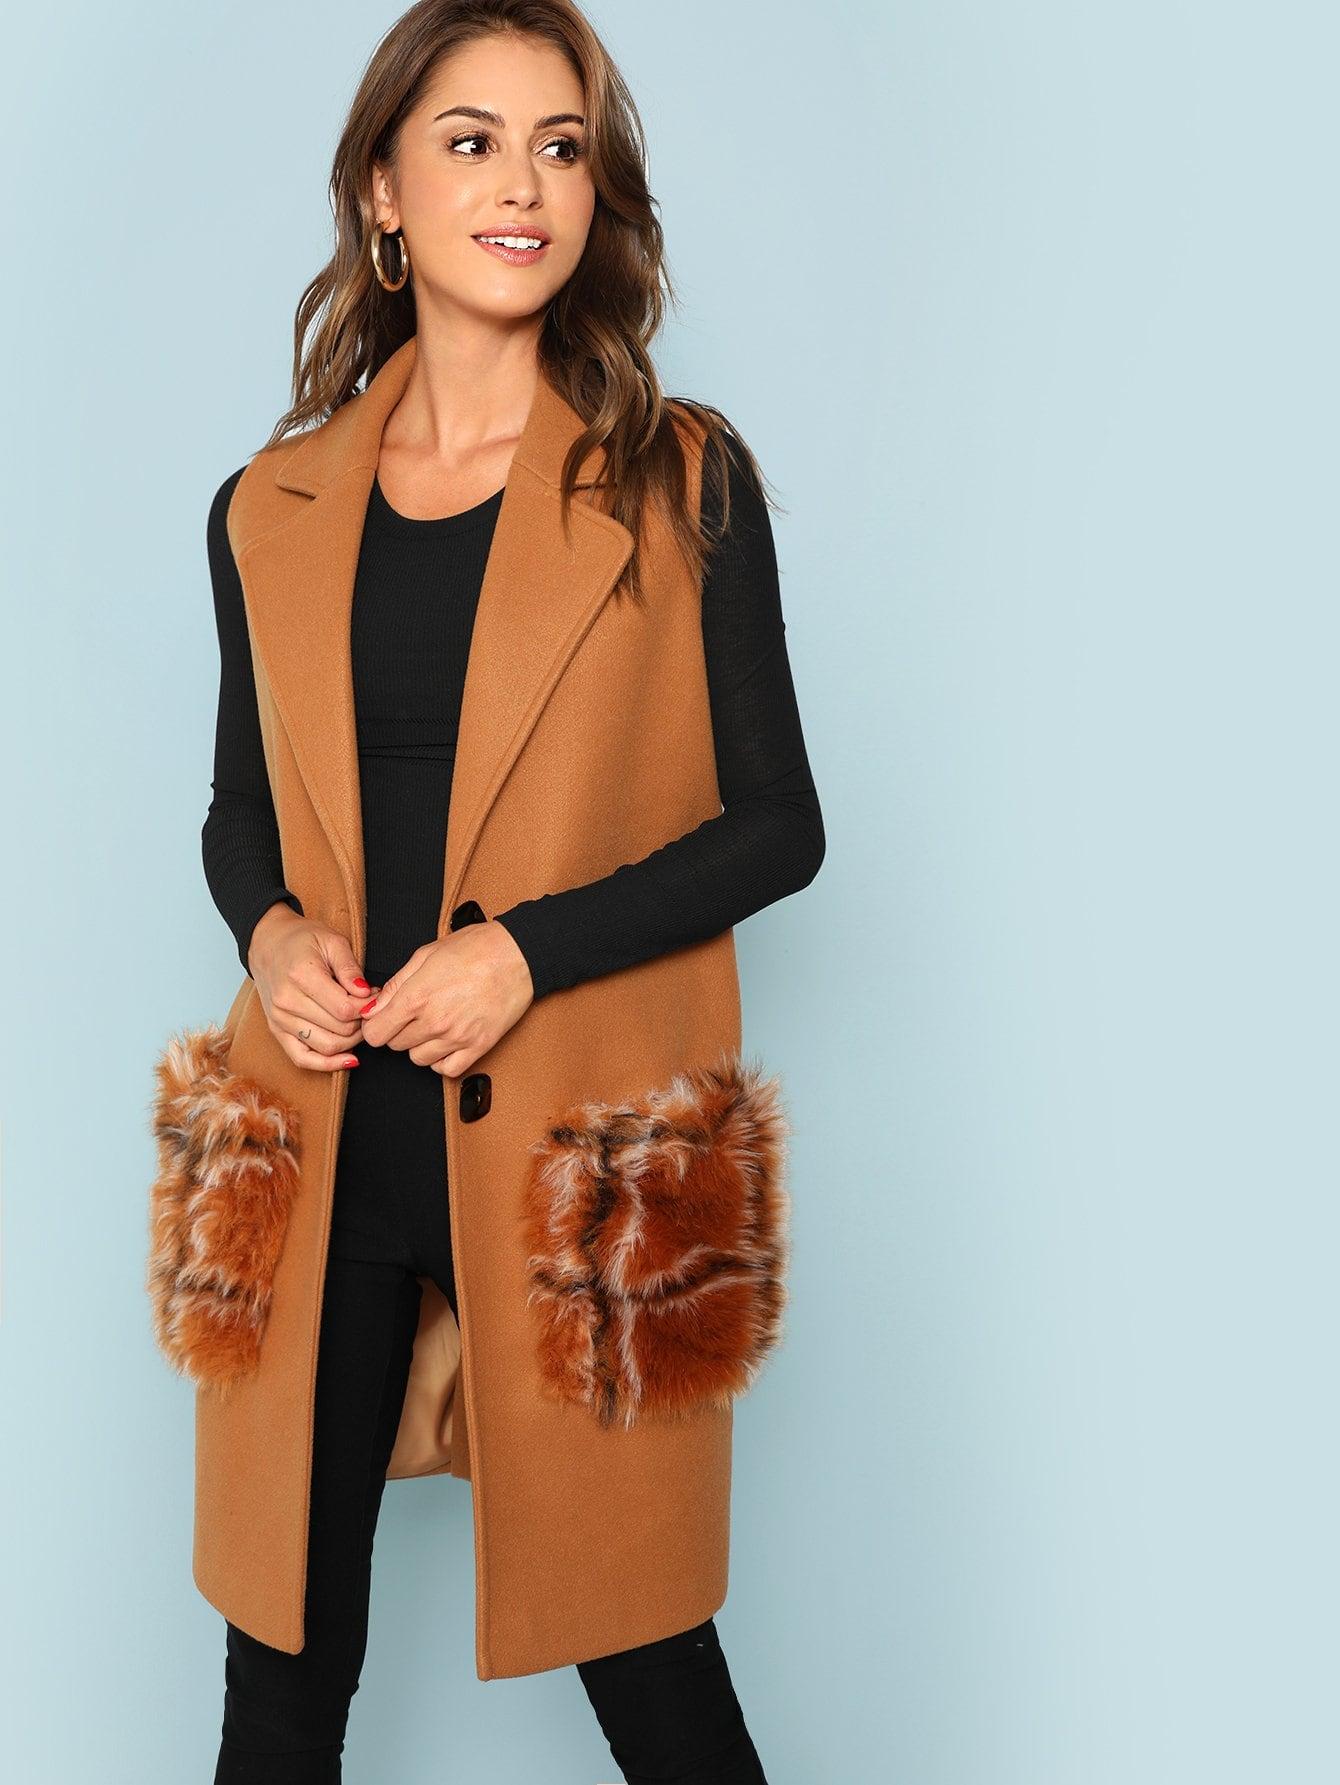 Exaggerate Collar Sleeveless Duffle Coat Exaggerate Collar Sleeveless Duffle Coat